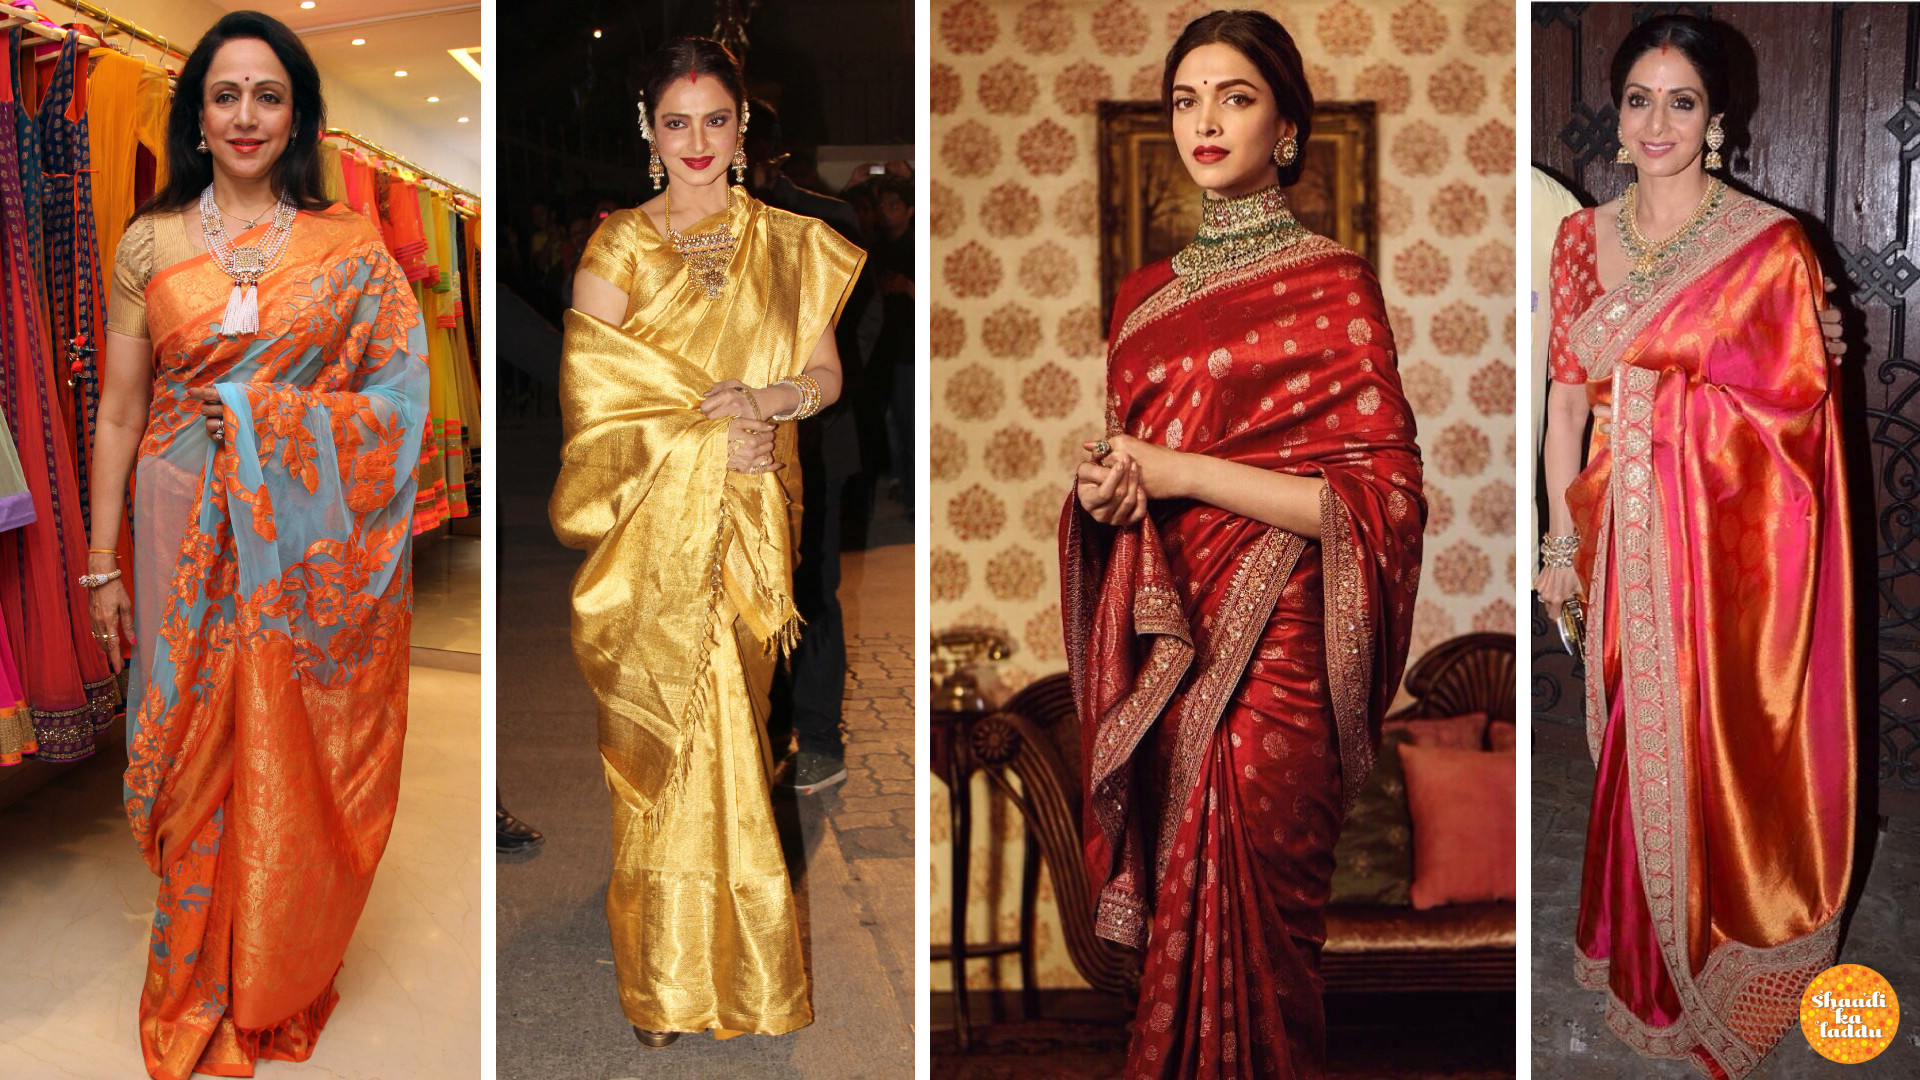 Hema Malini, Rekha, Sridevi, in heavy elegant silk sarees